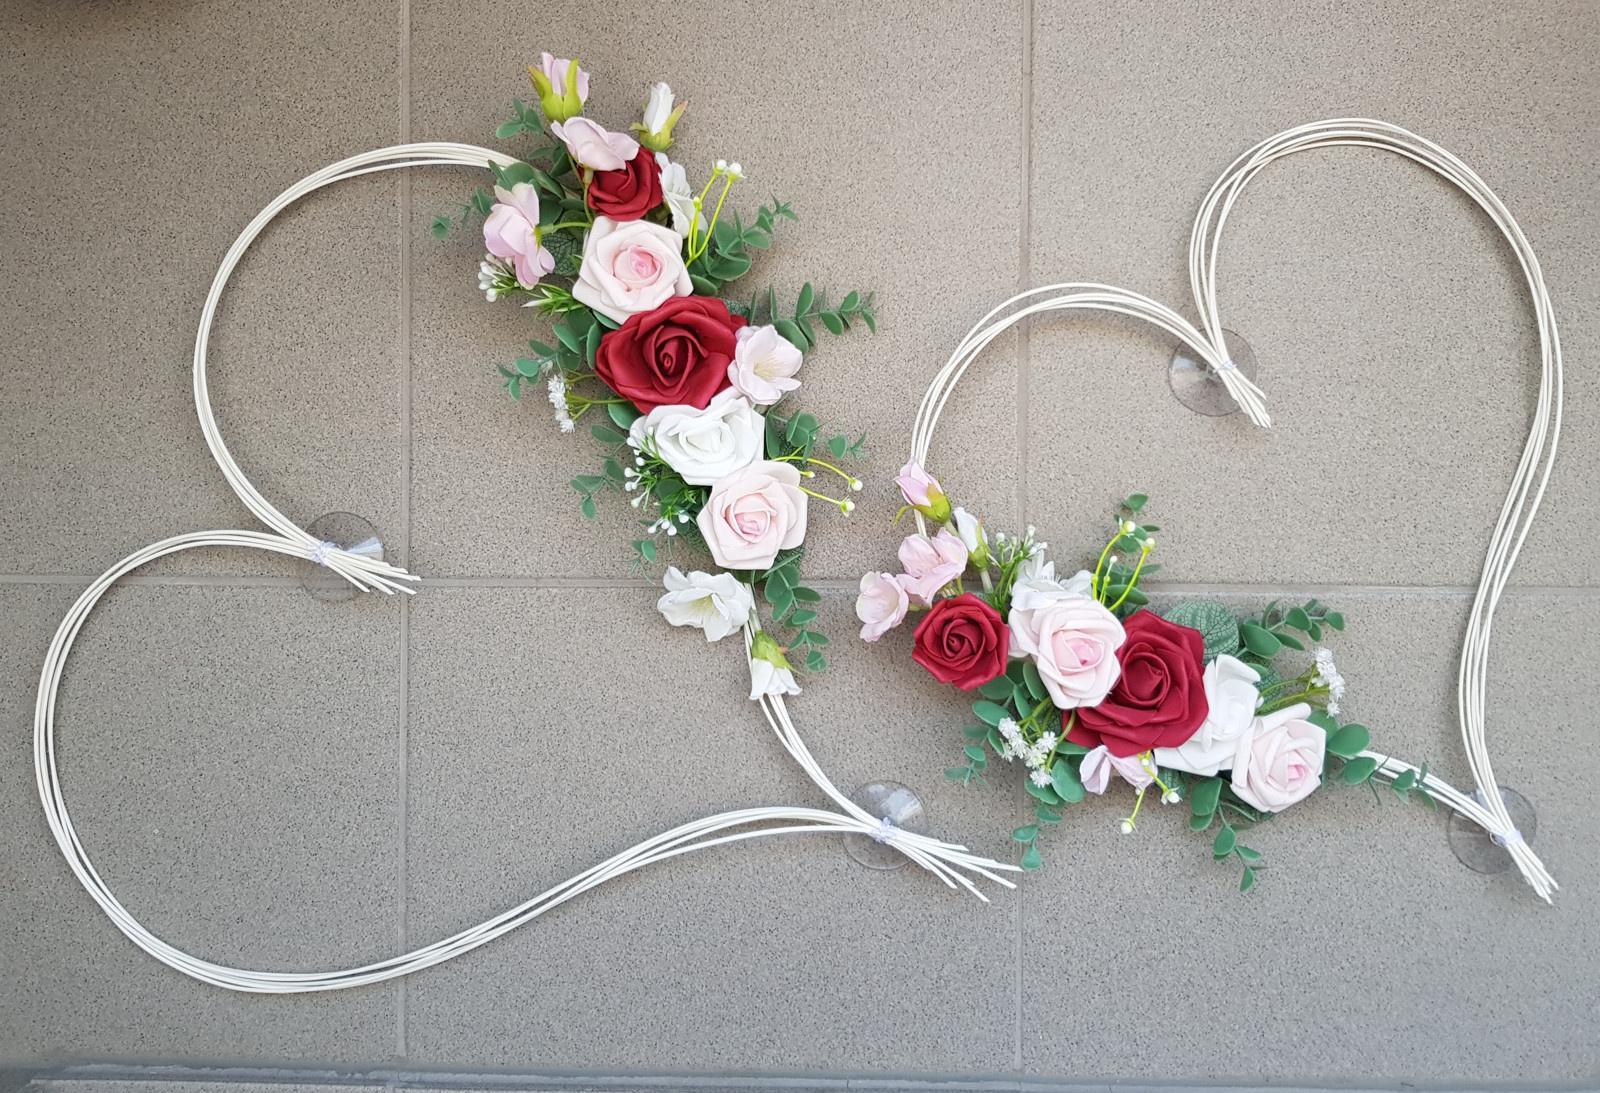 Srdce na kapotu bílá, růžová a bordó - Obrázek č. 1